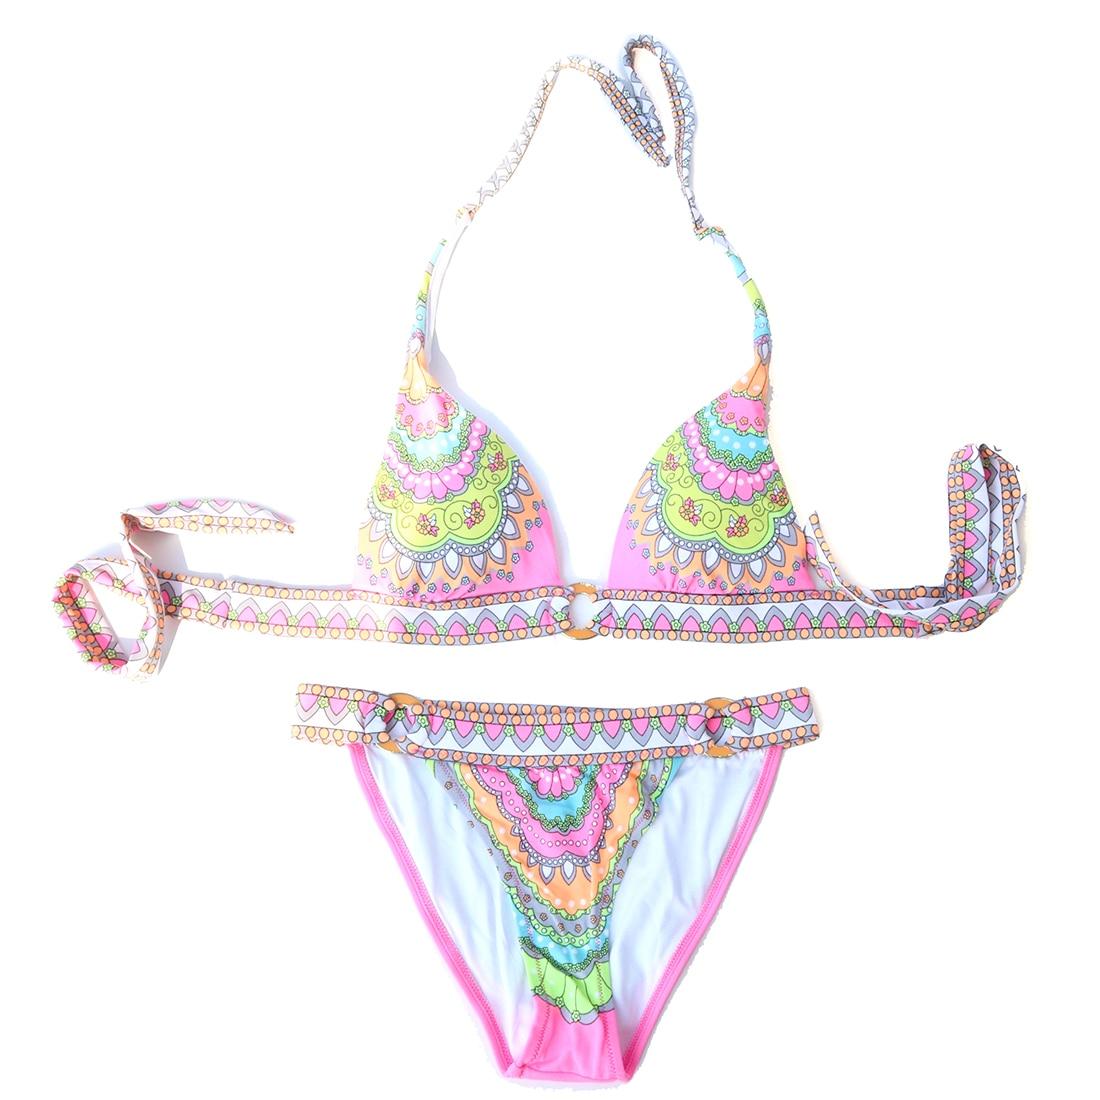 2019 Women Bikini Pink Print Bikinis Swimsuit Vintage Swimming Suit Female Bathing Suit Sexy Swimwear Design Secret Купальник